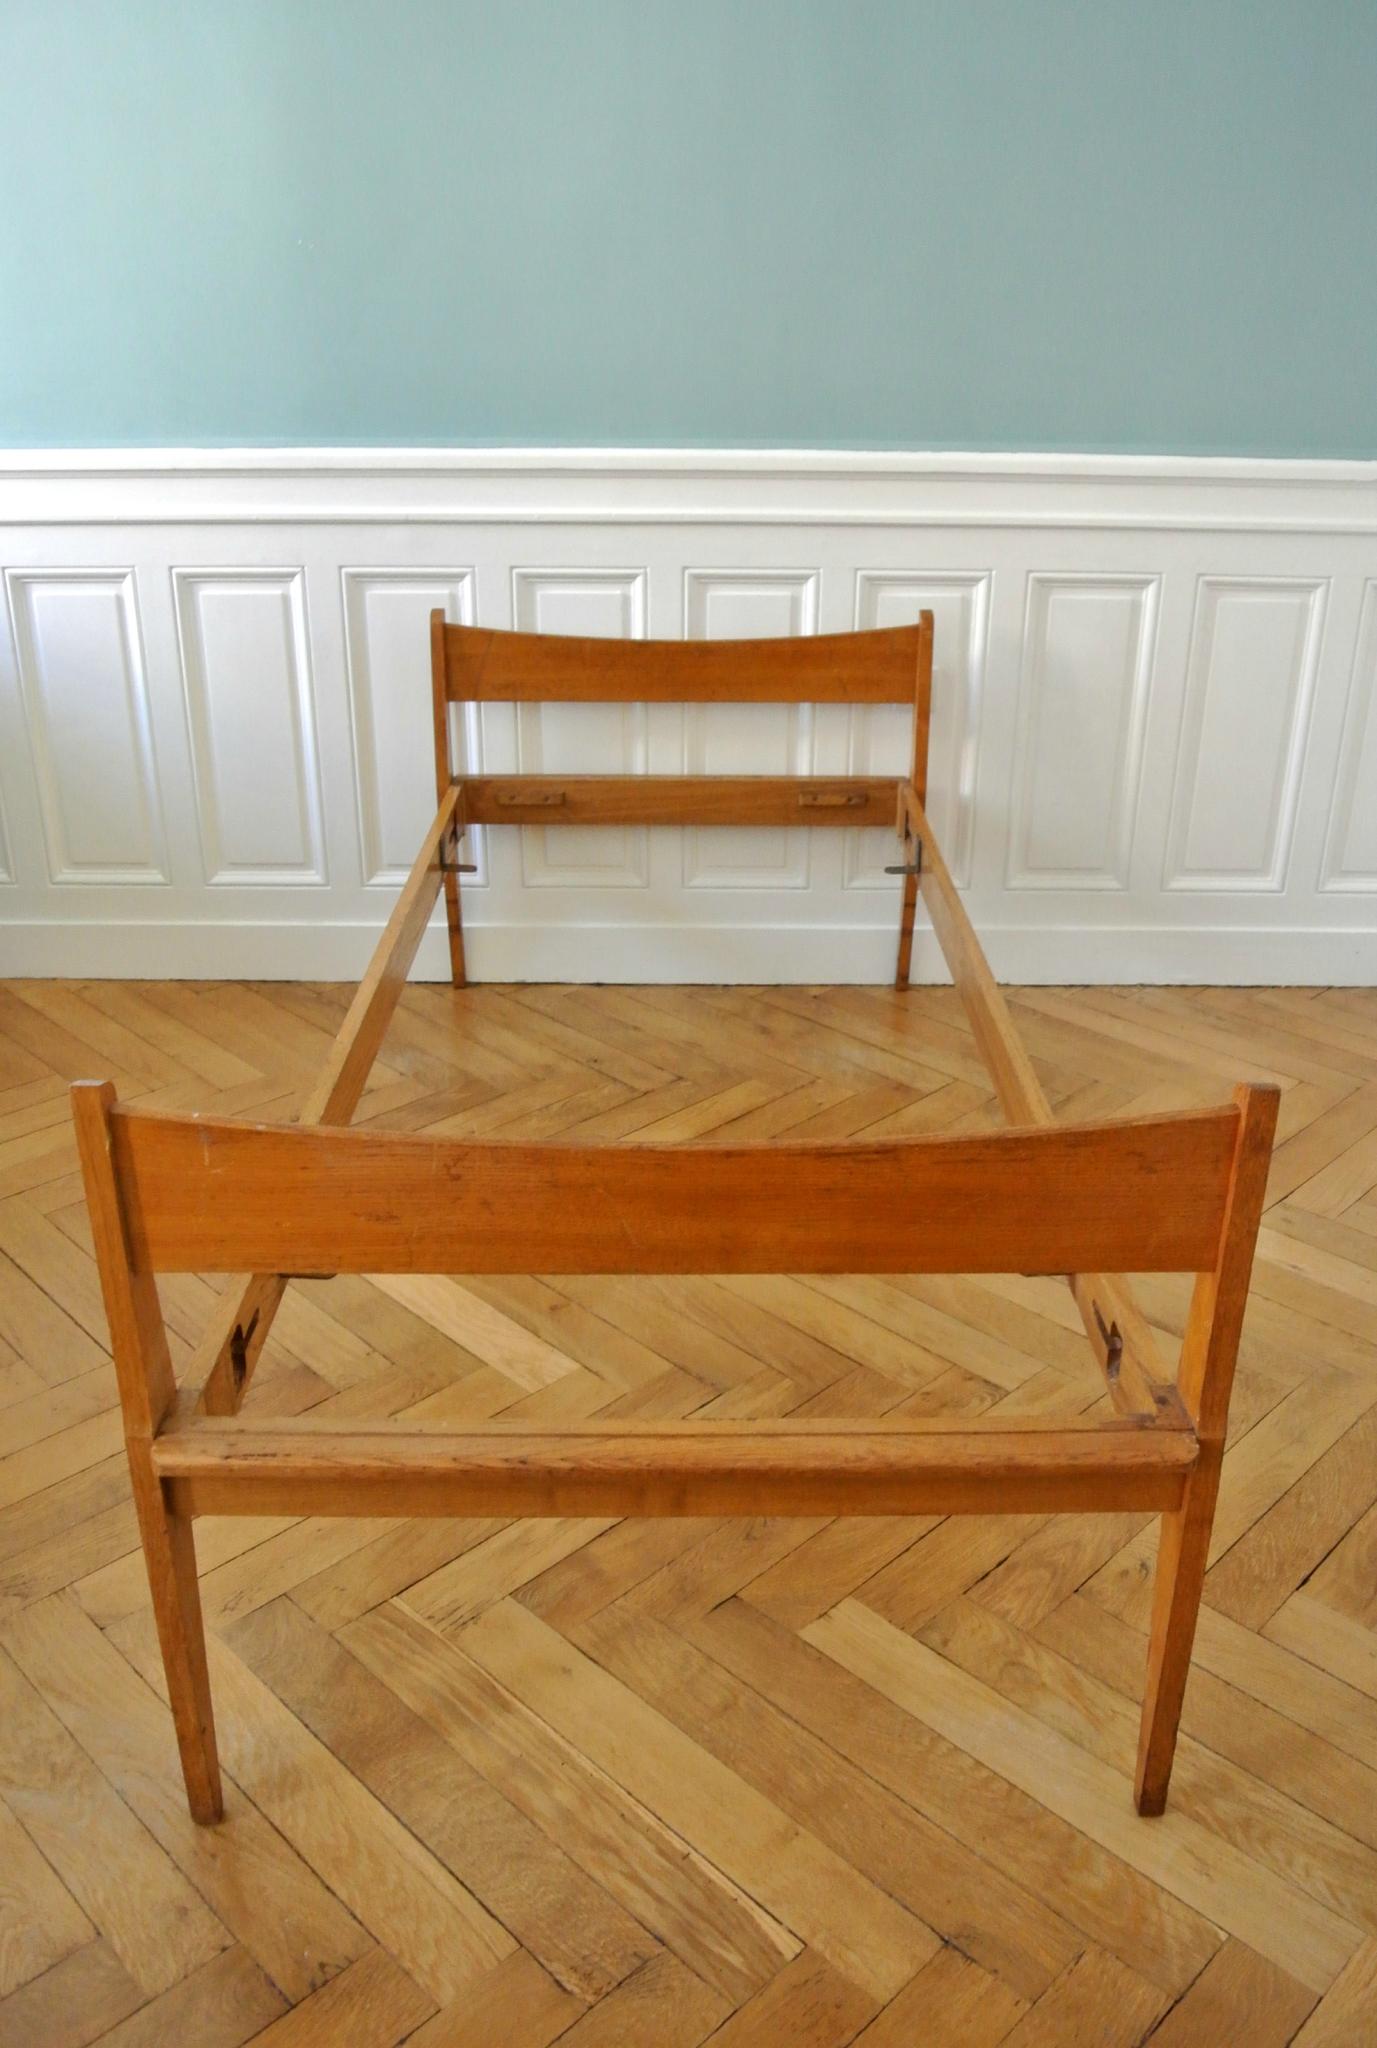 Lit de repos scandinave des ann es 50 solveig vintage galerie - Lit scandinave vintage ...